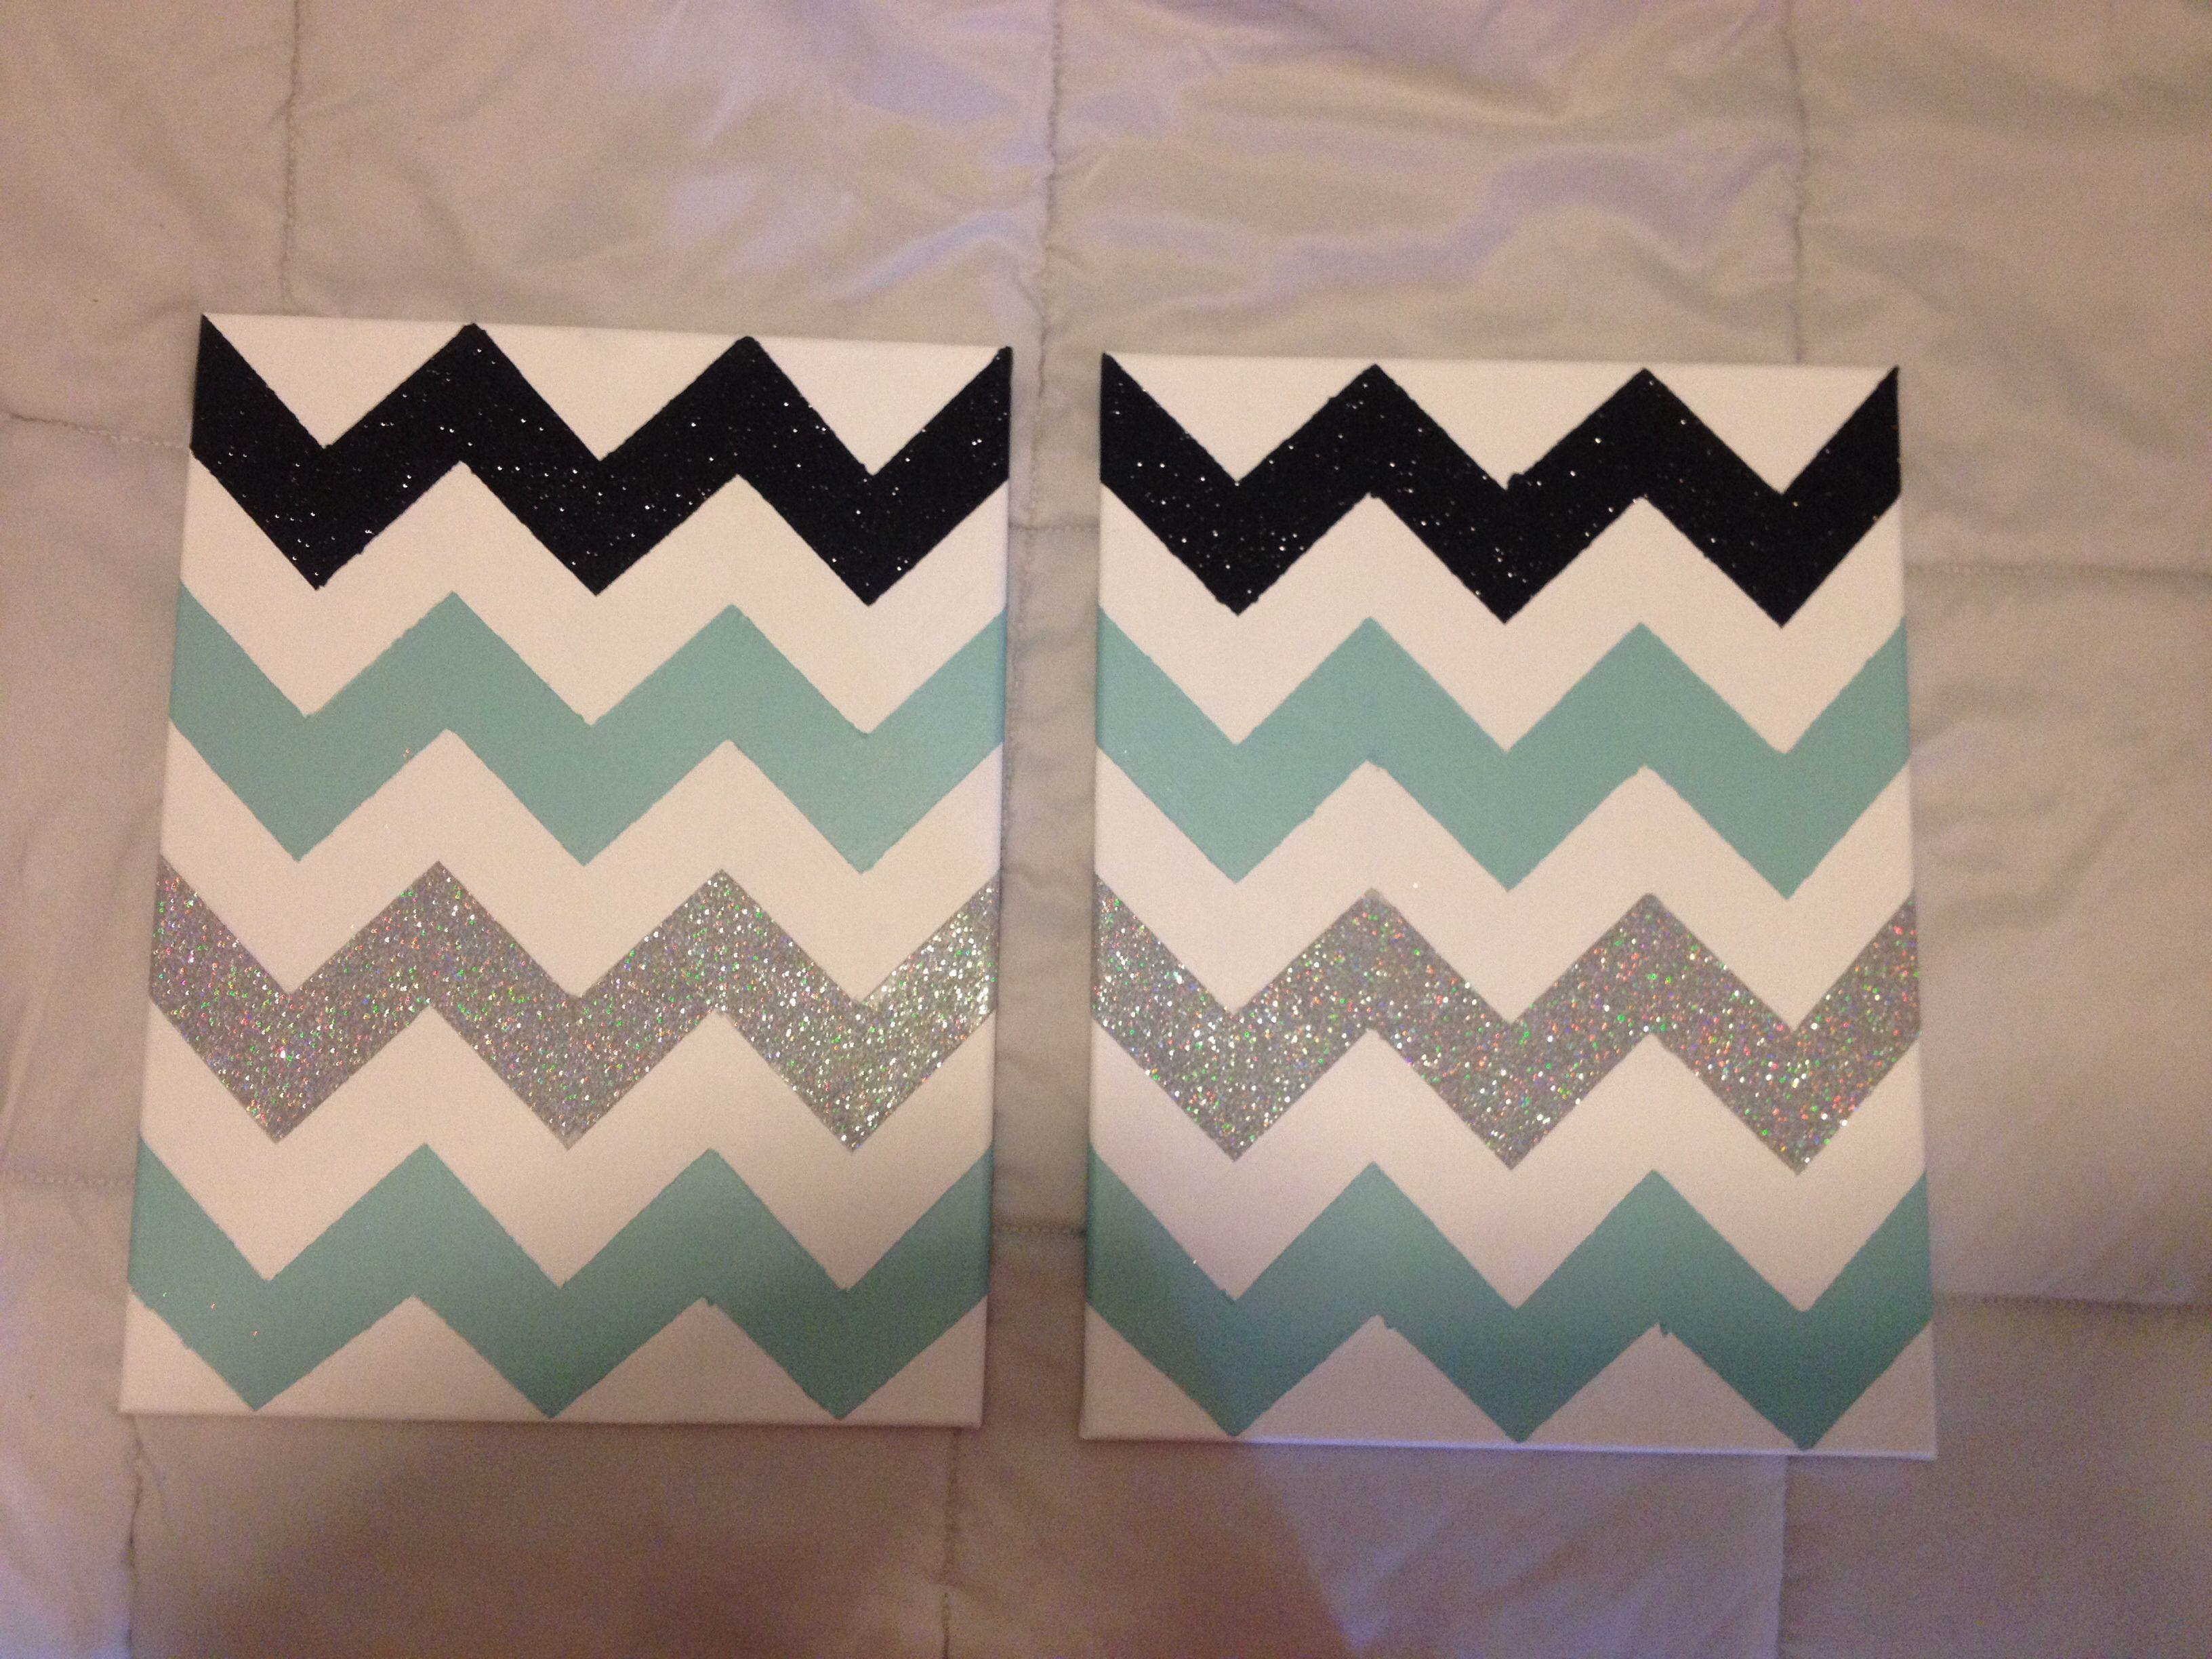 DIY chevron canvas! Make your chevron pattern, tape off